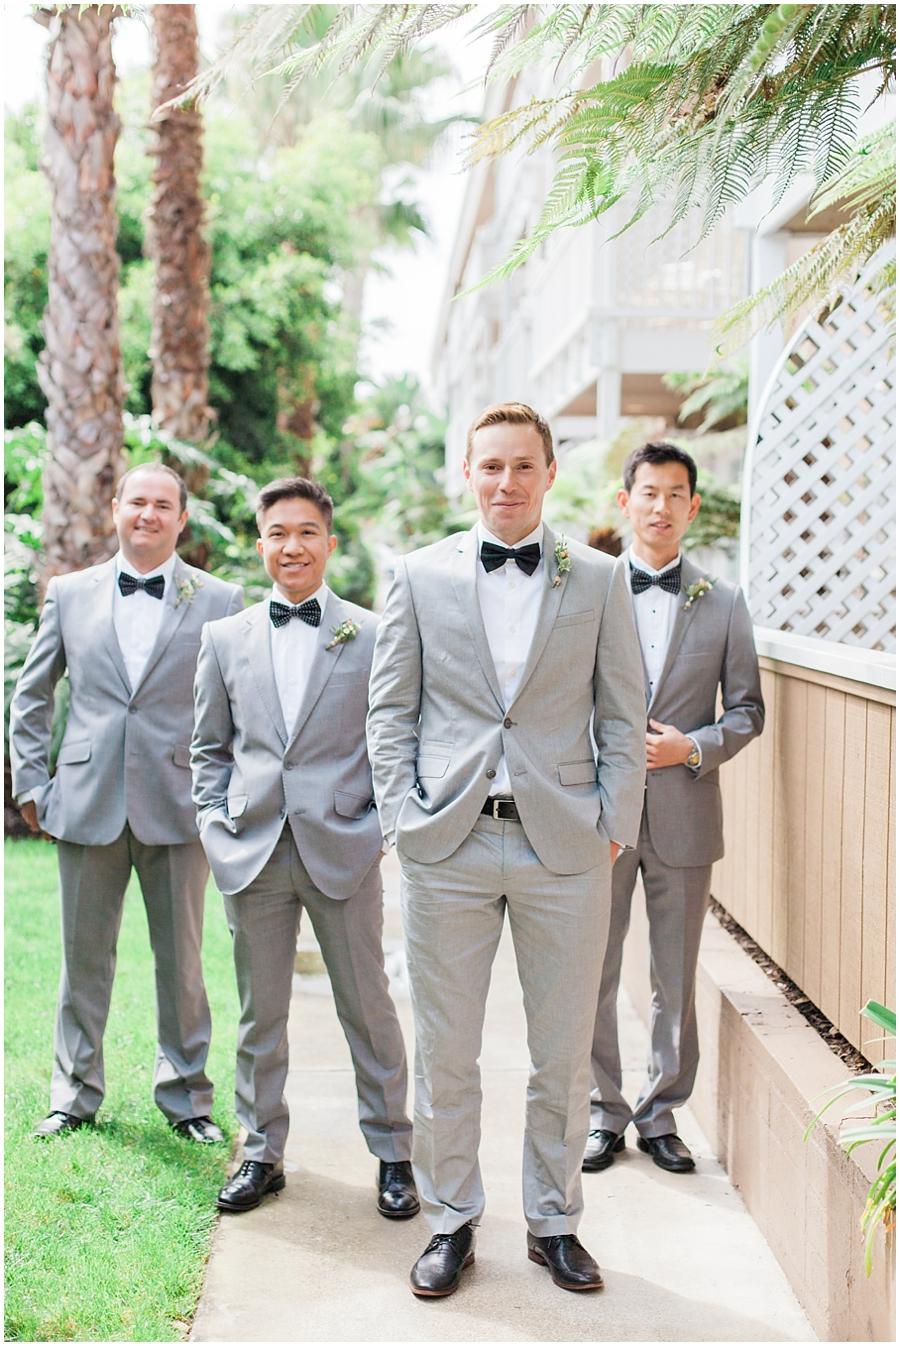 Russ + Claudine | Portofino Hotel Wedding | ©Danielle Bacon Photography | daniellebaconphotography.com